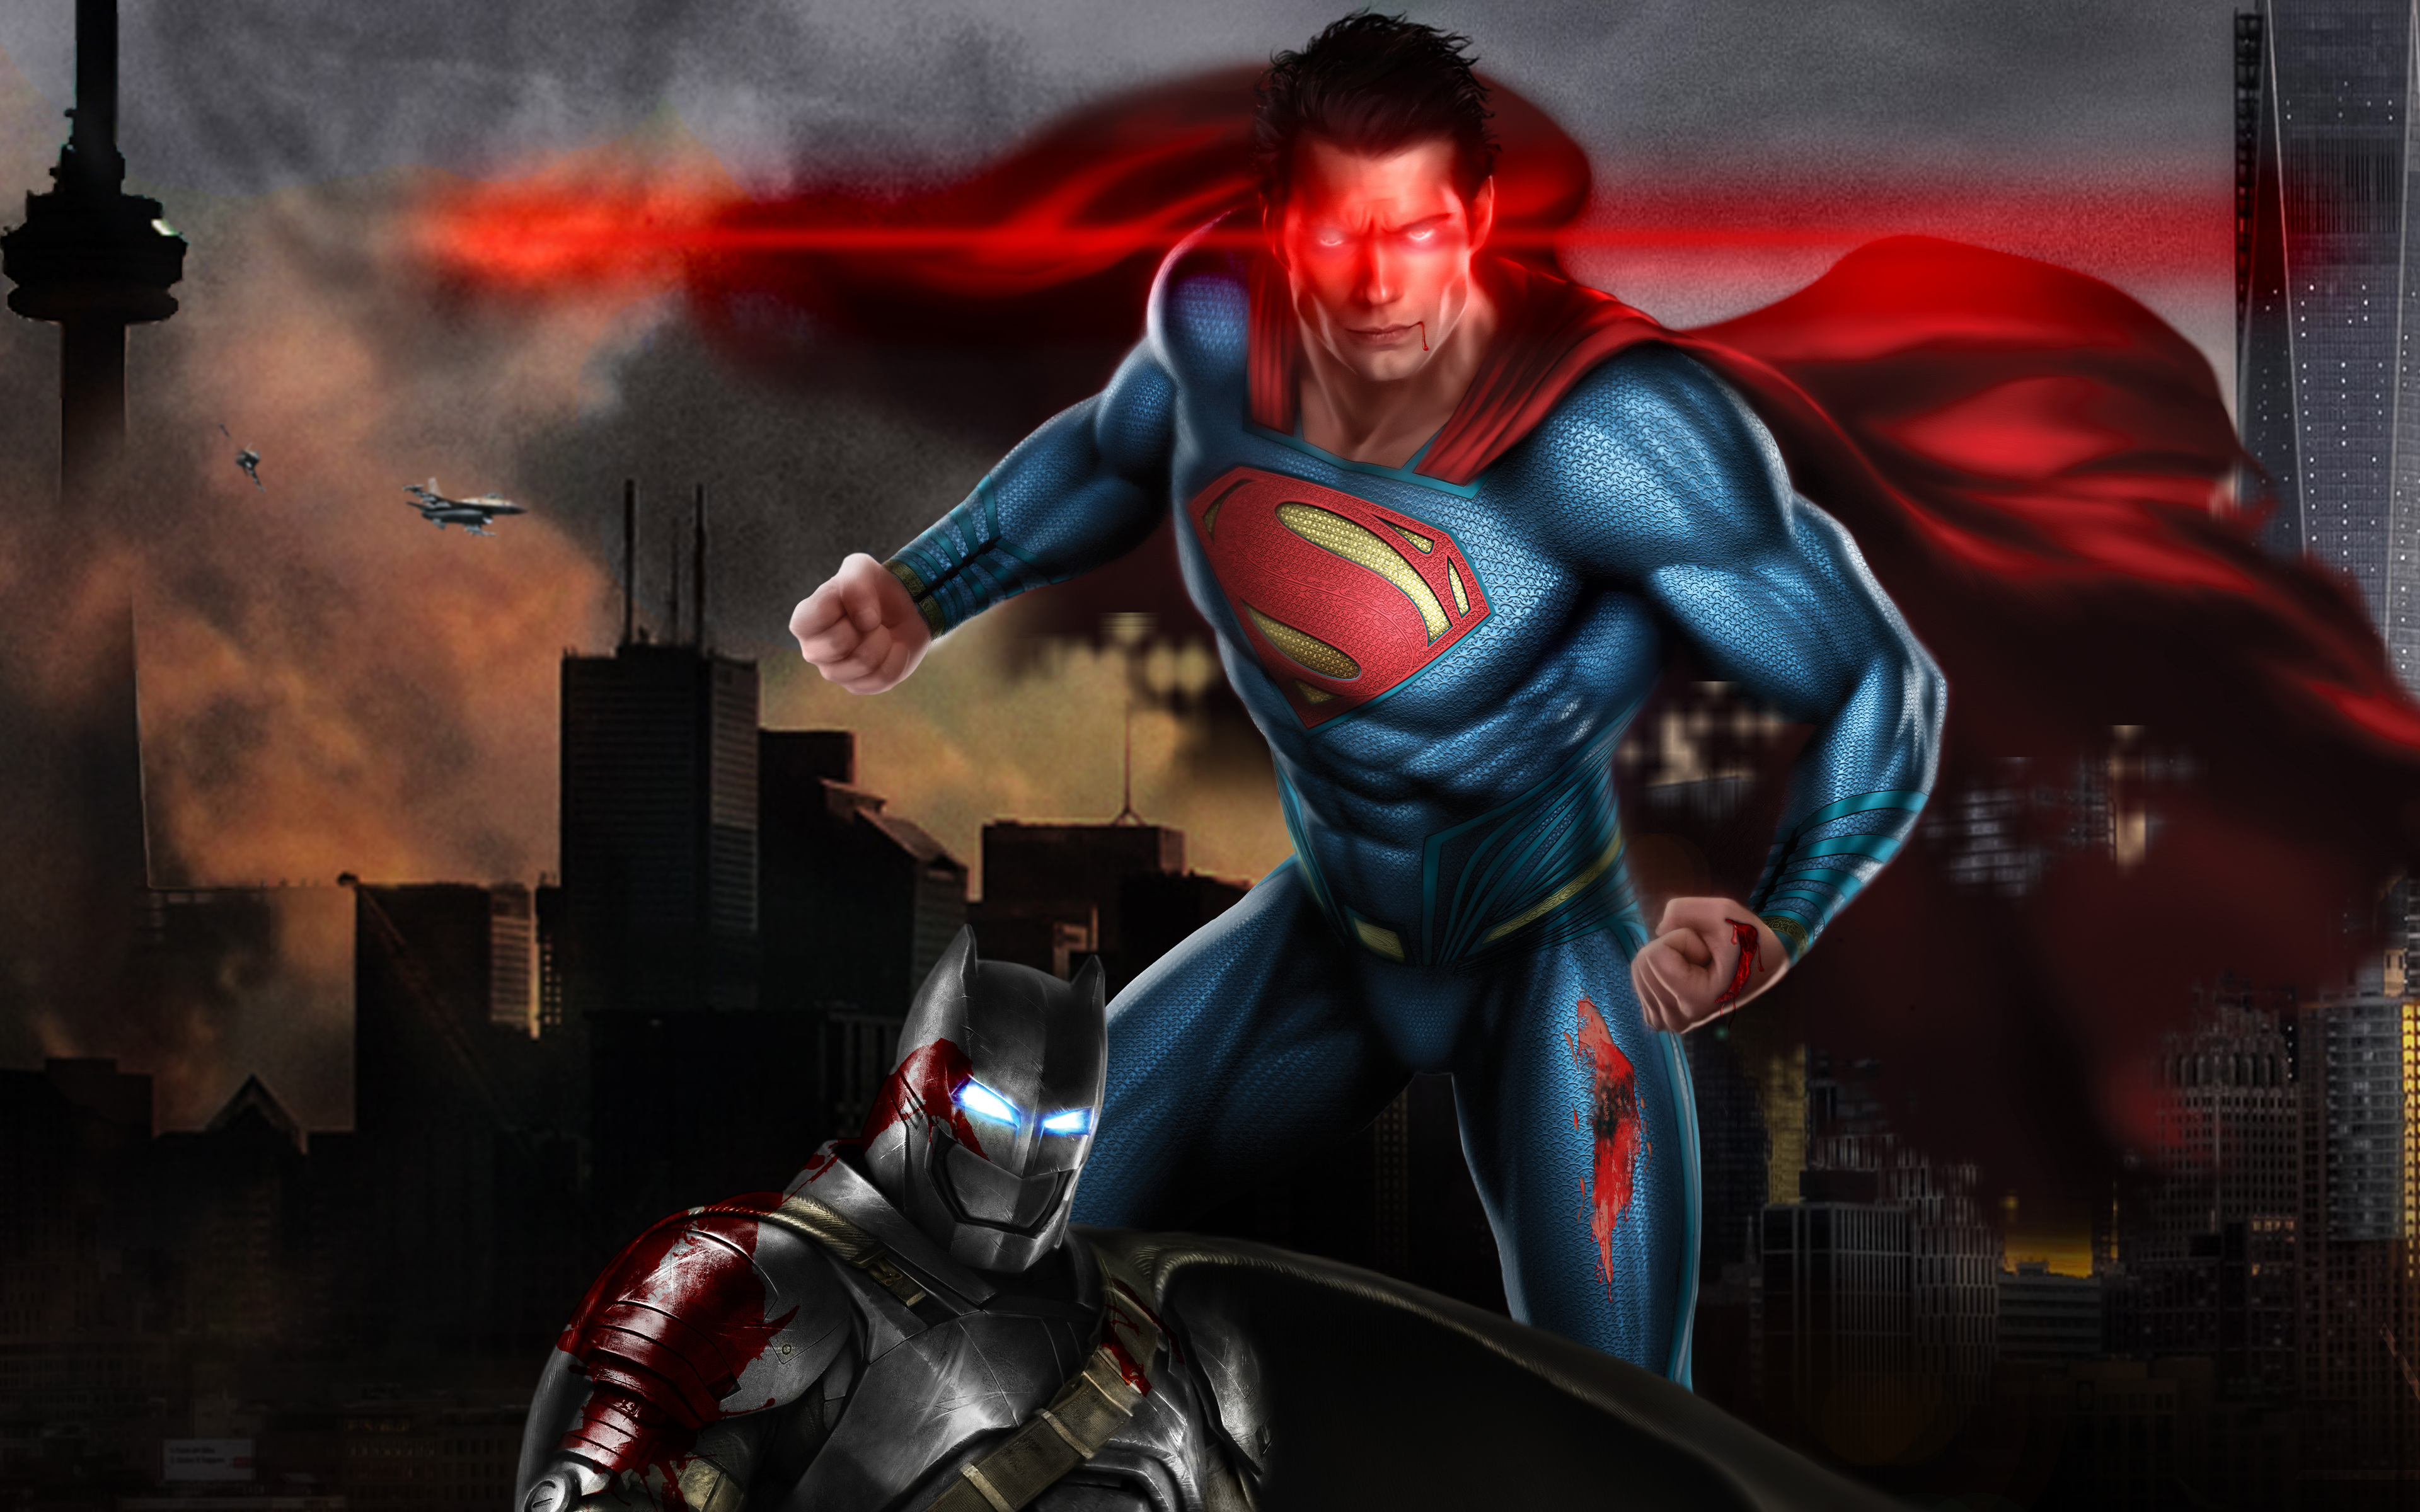 superman-vs-batman-5k-art-1o.jpg